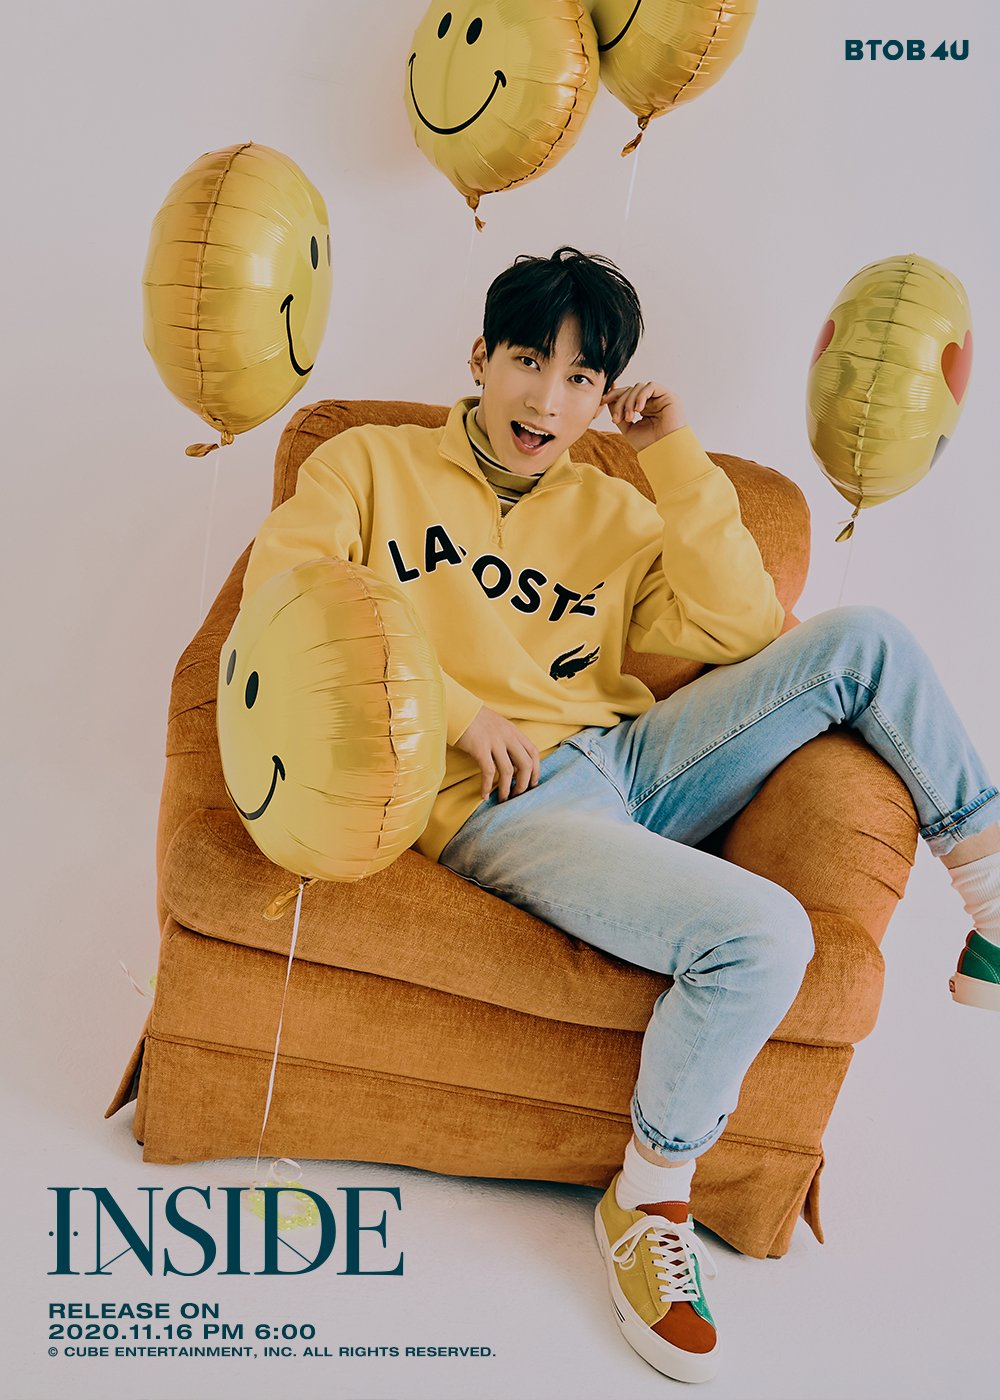 BTOB 4U 1st Mini Album Image Teaser - Seo Eun Kwang